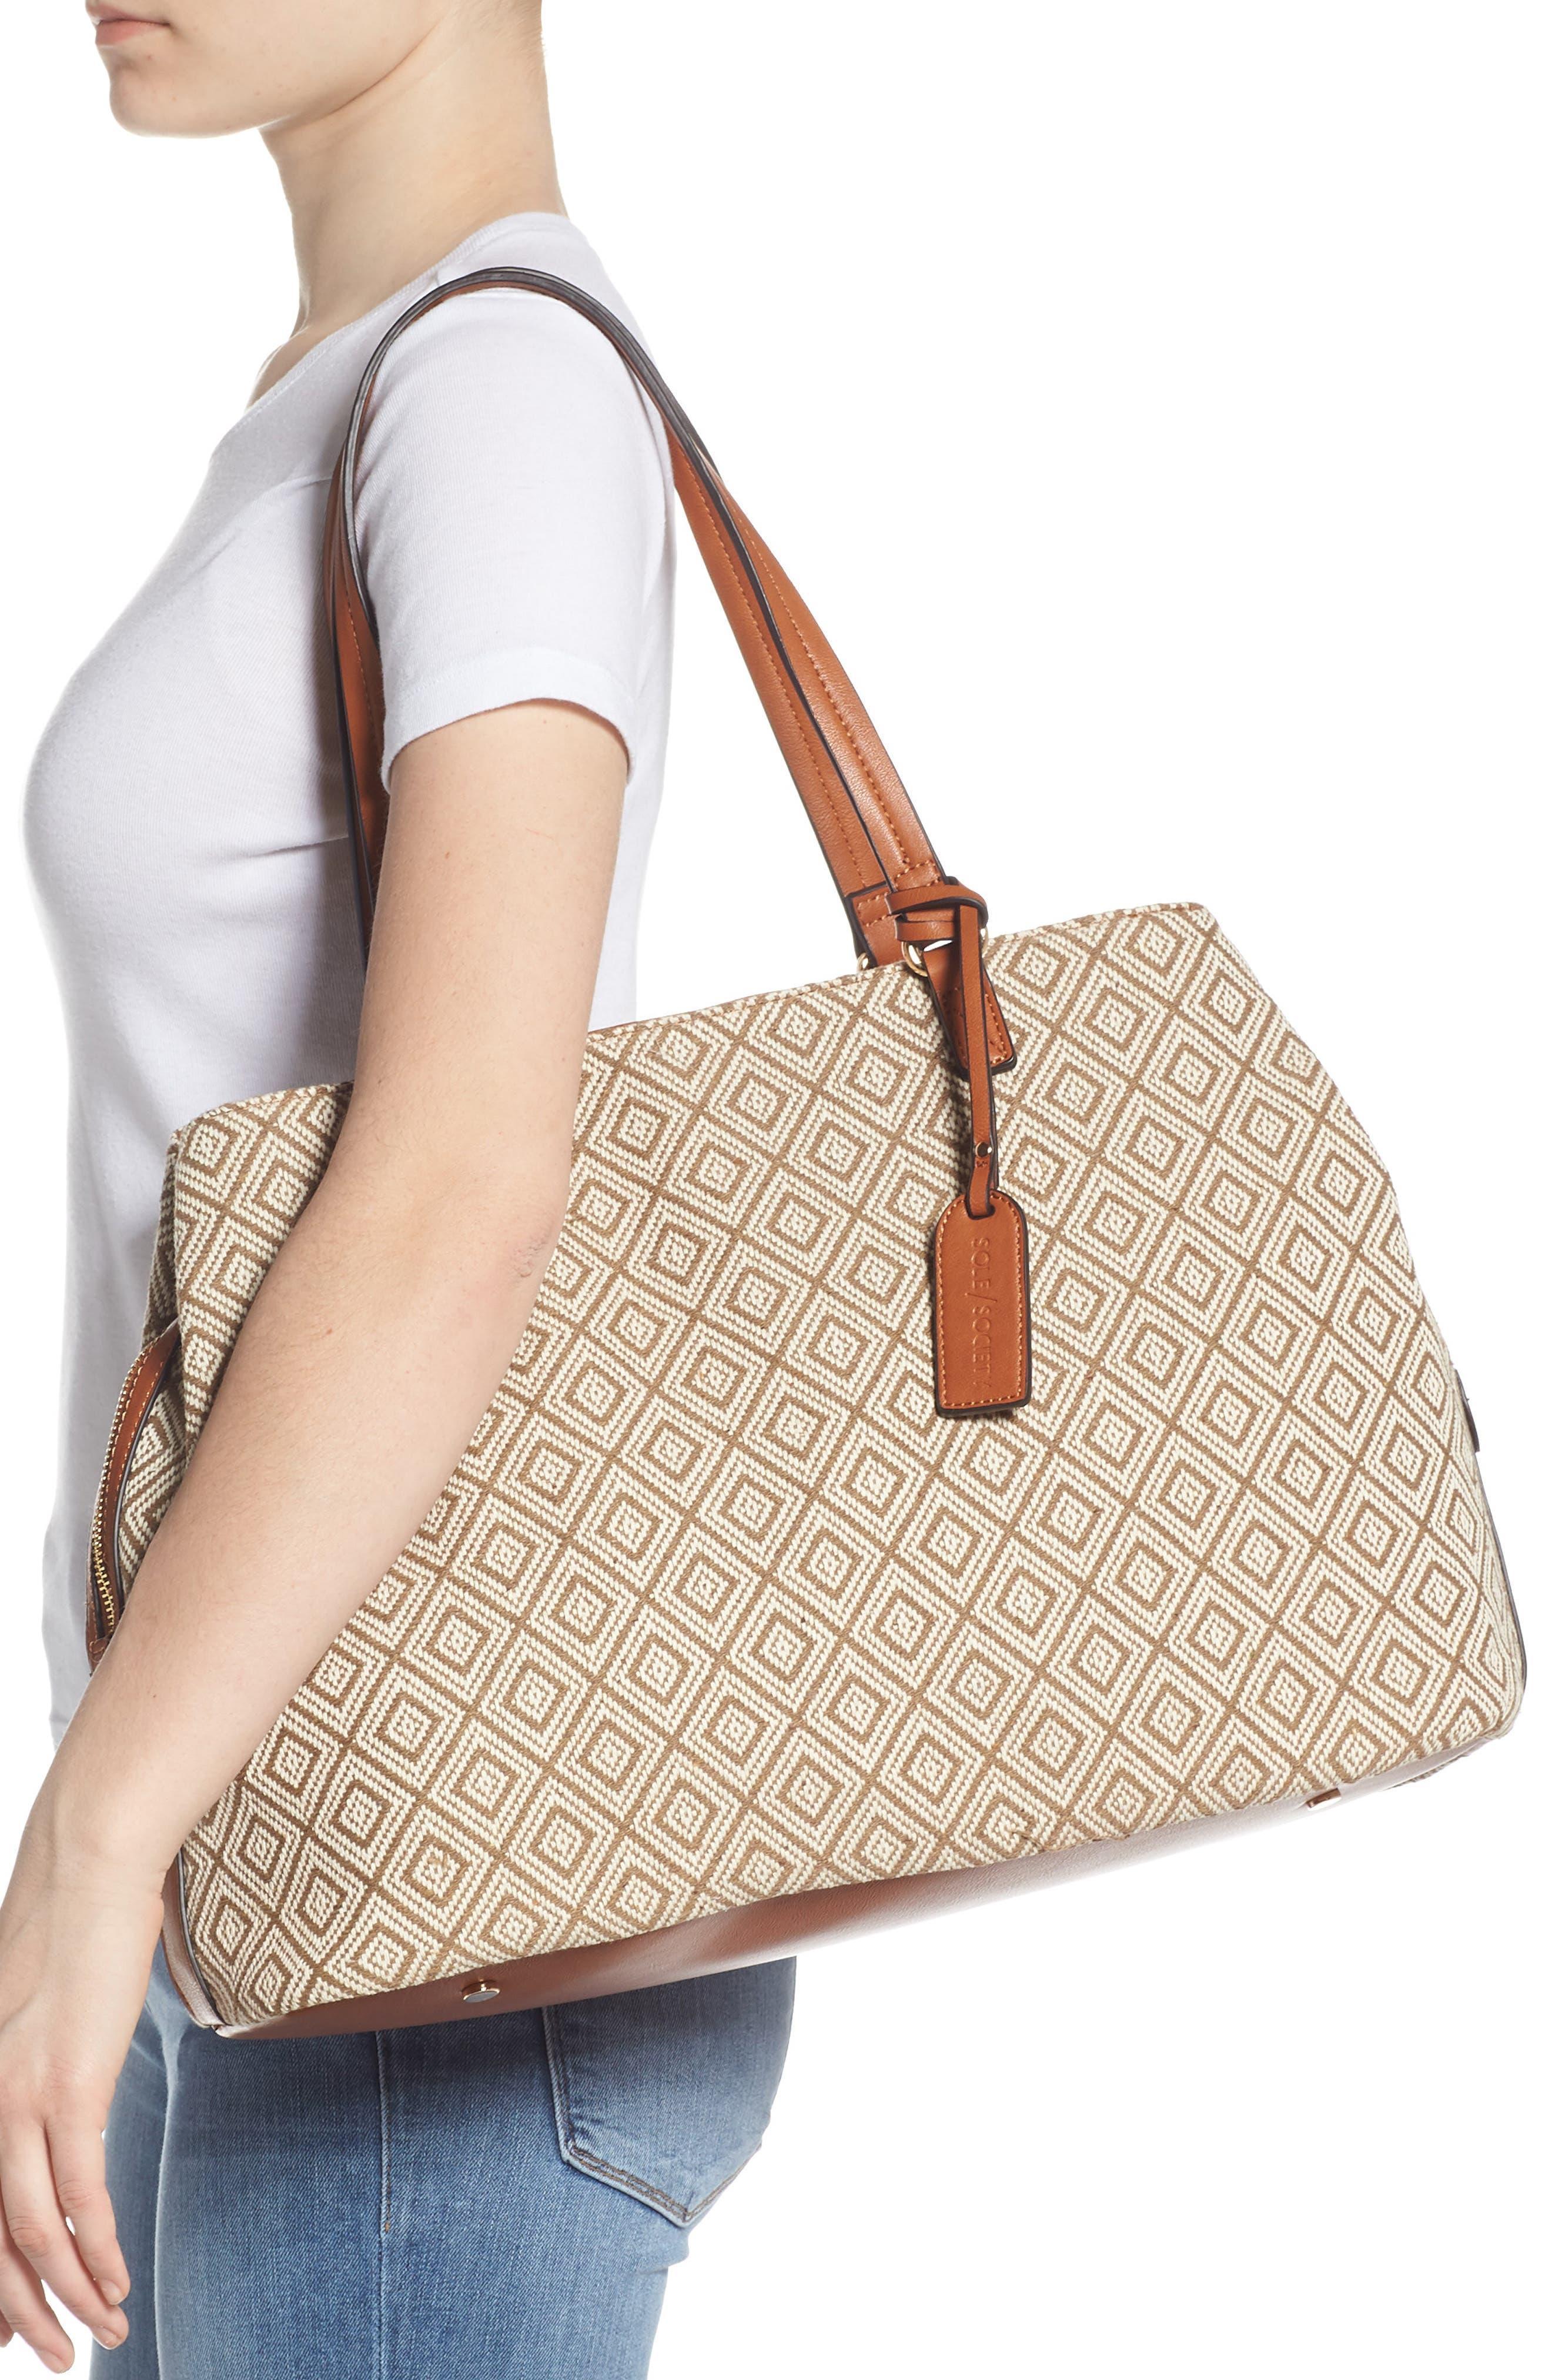 0f75c2deaa56 Sole Society Handbags & Wallets for Women | Nordstrom